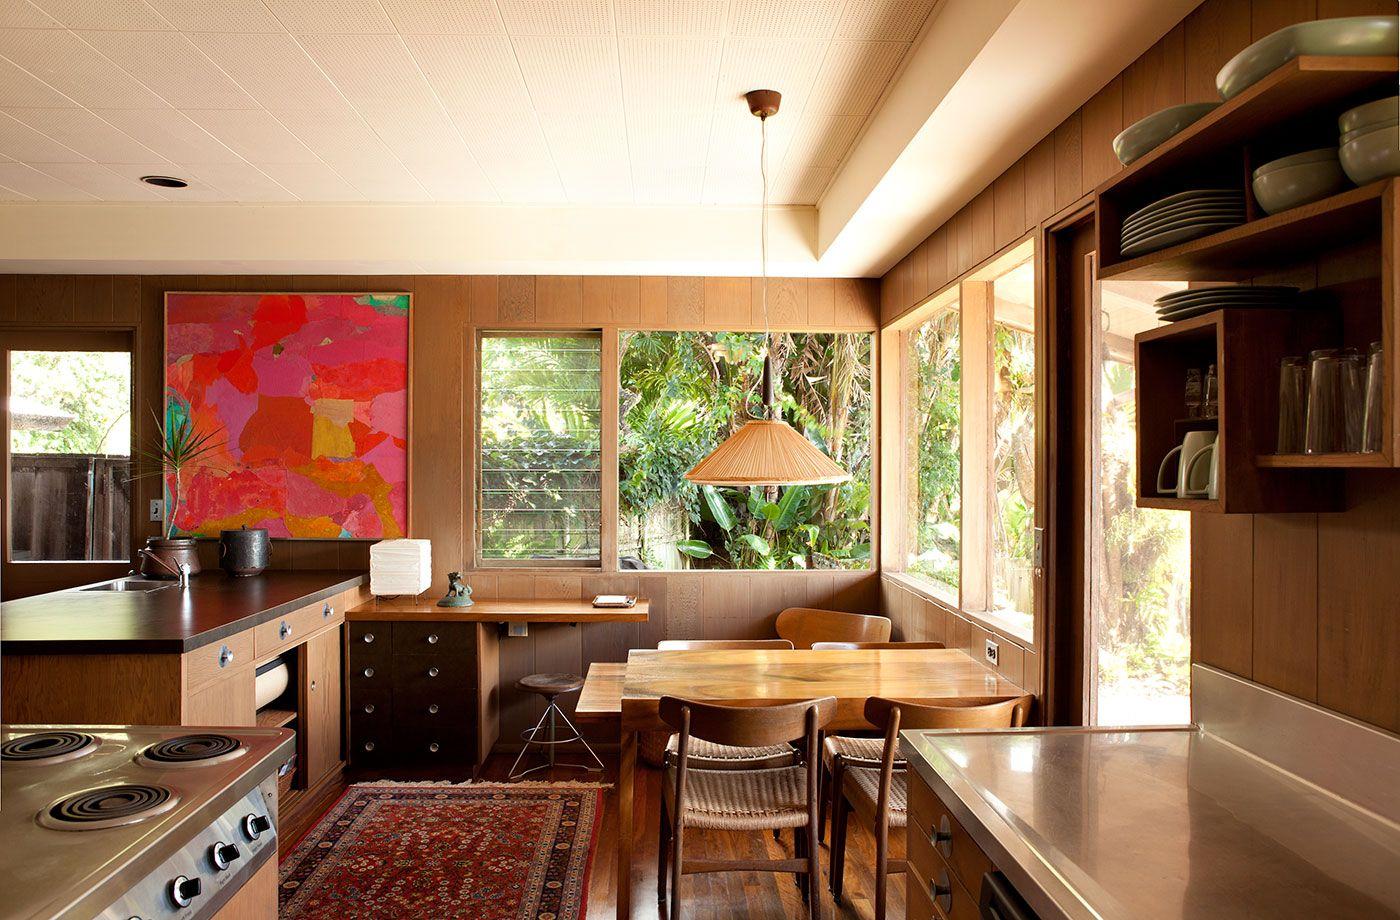 vladimir ossipoff architect liljestrand house honolulu a house rh pinterest com